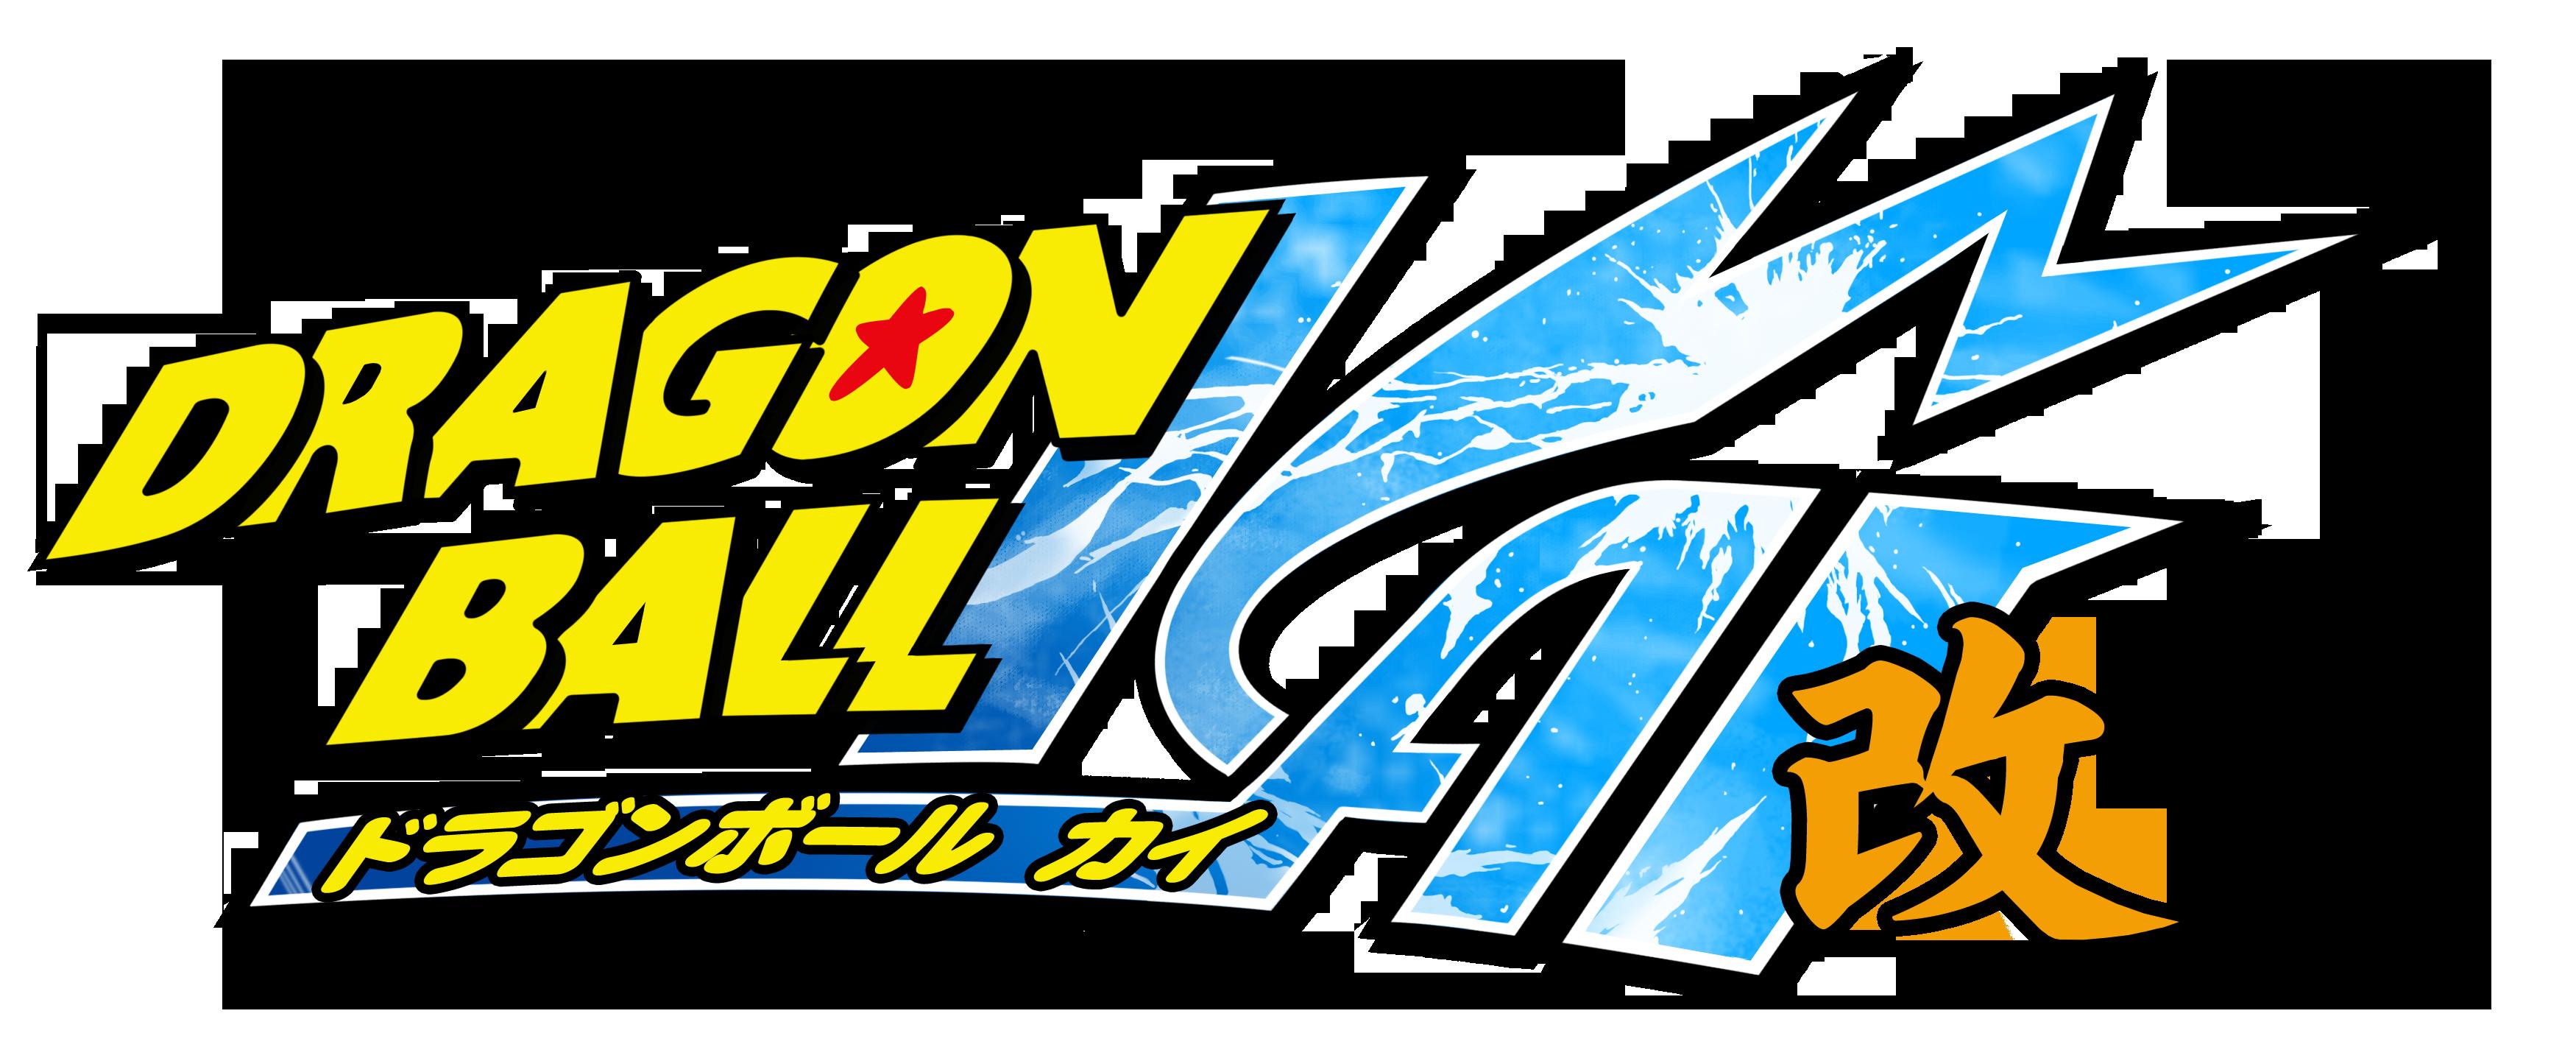 Dragon ball kai Logos